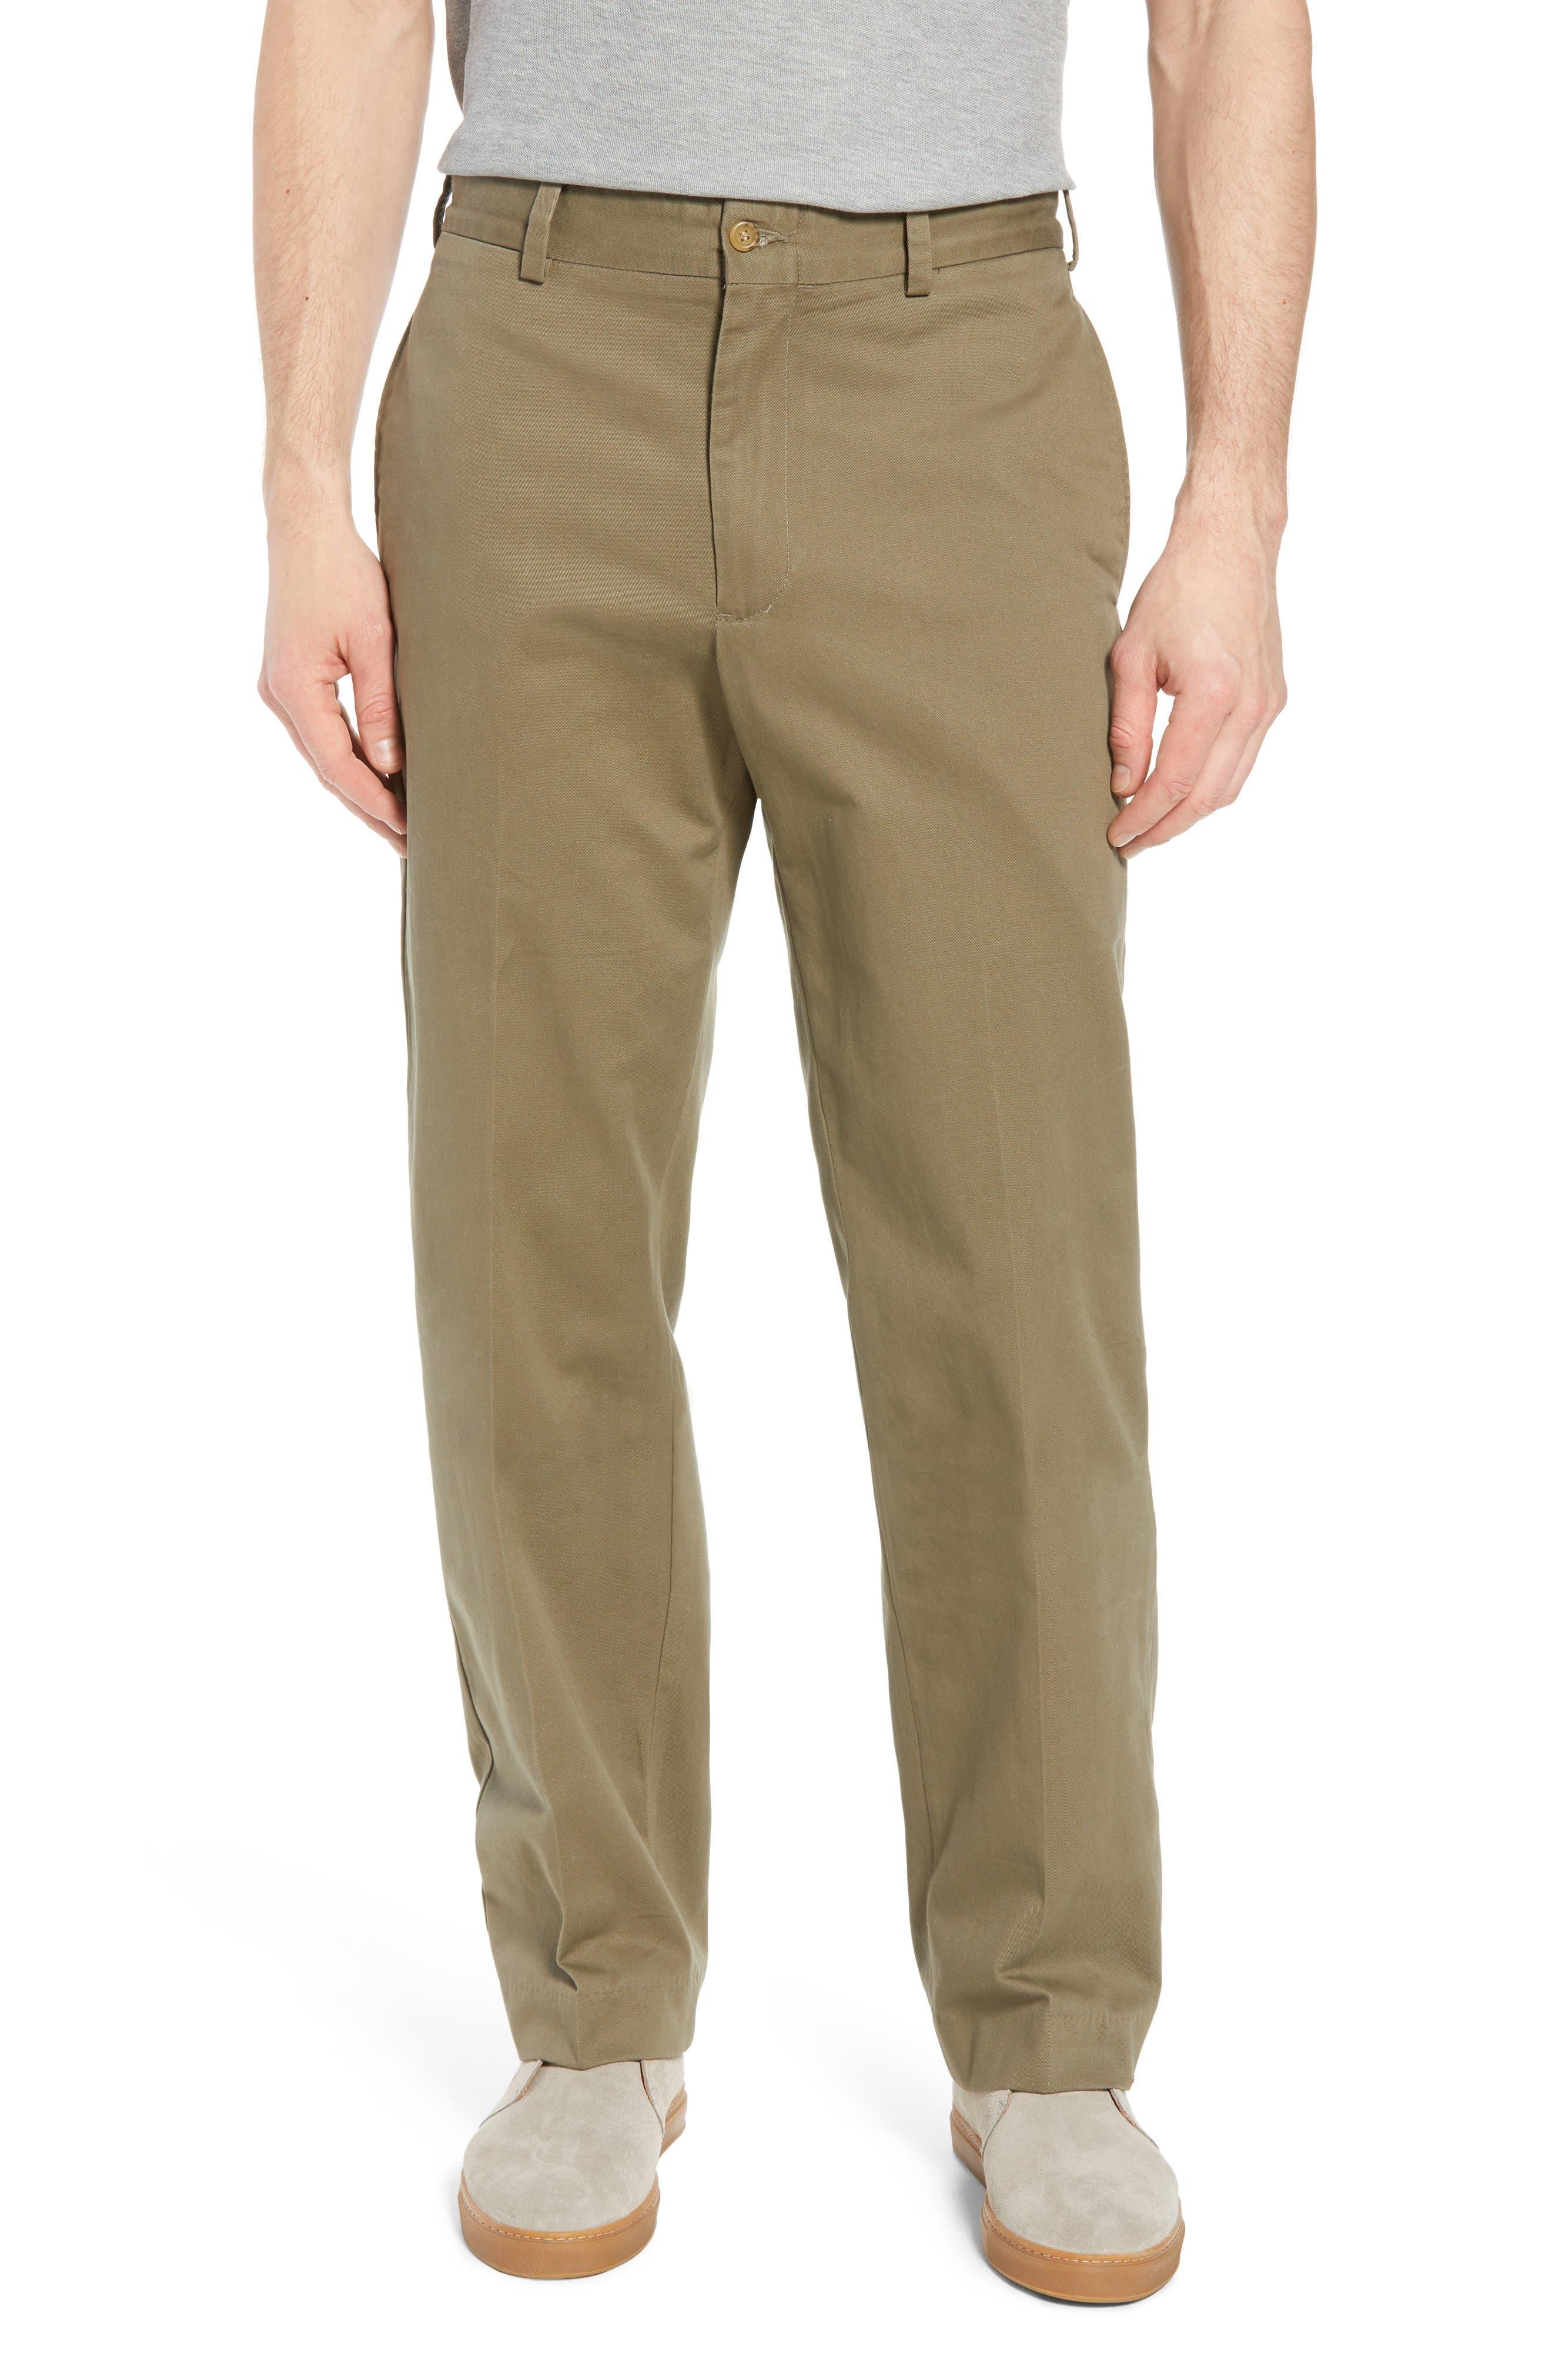 M2 Classic Fit Flat Front Vintage Twill Pants,                         Main,                         color, 330